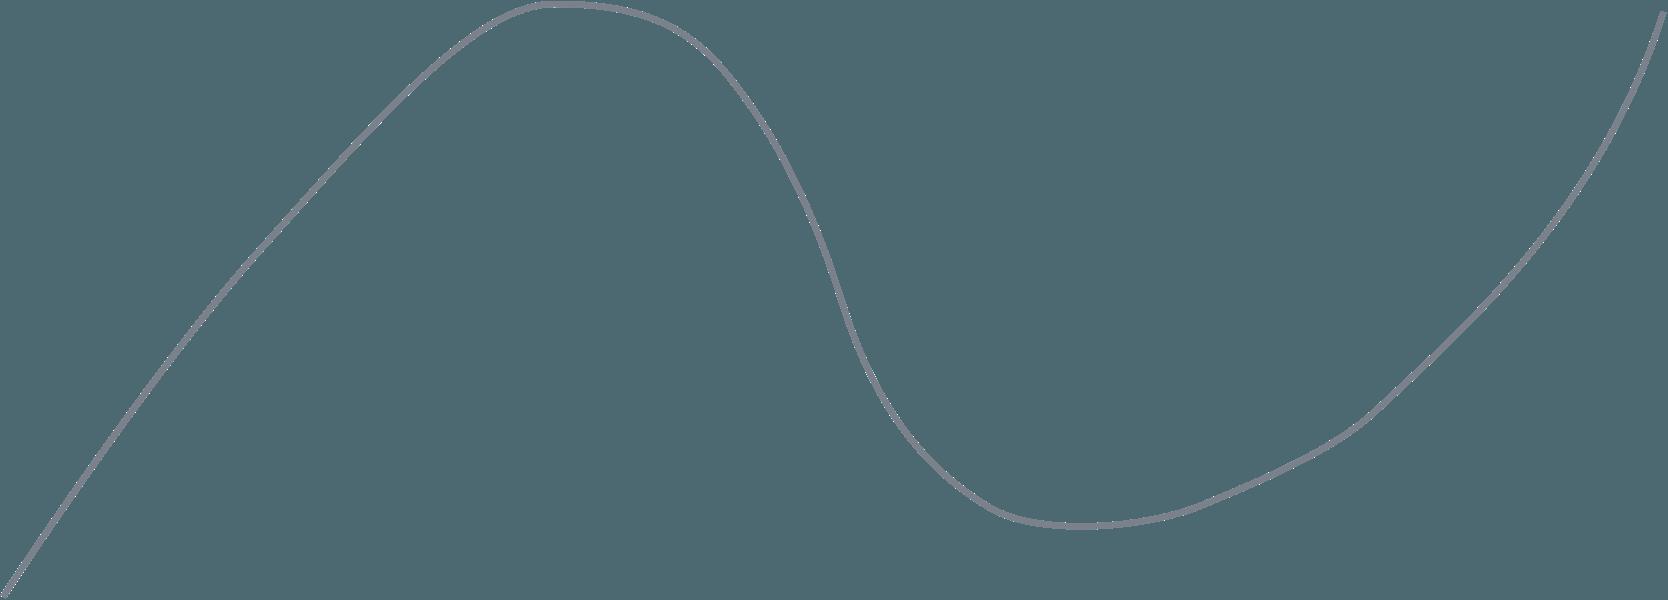 line2_big3.png